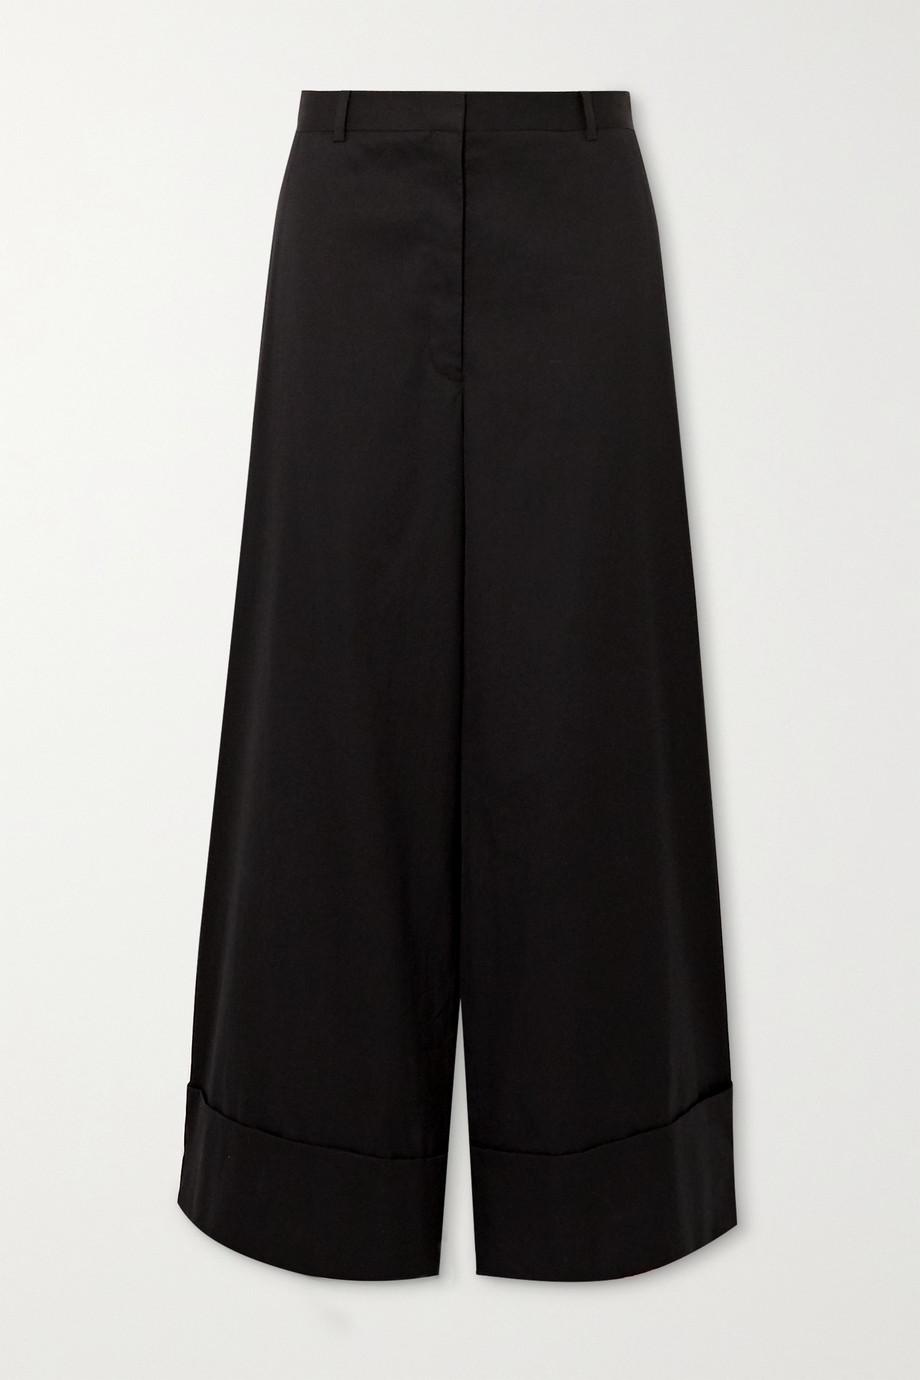 The Row Carter cotton wide-leg pants